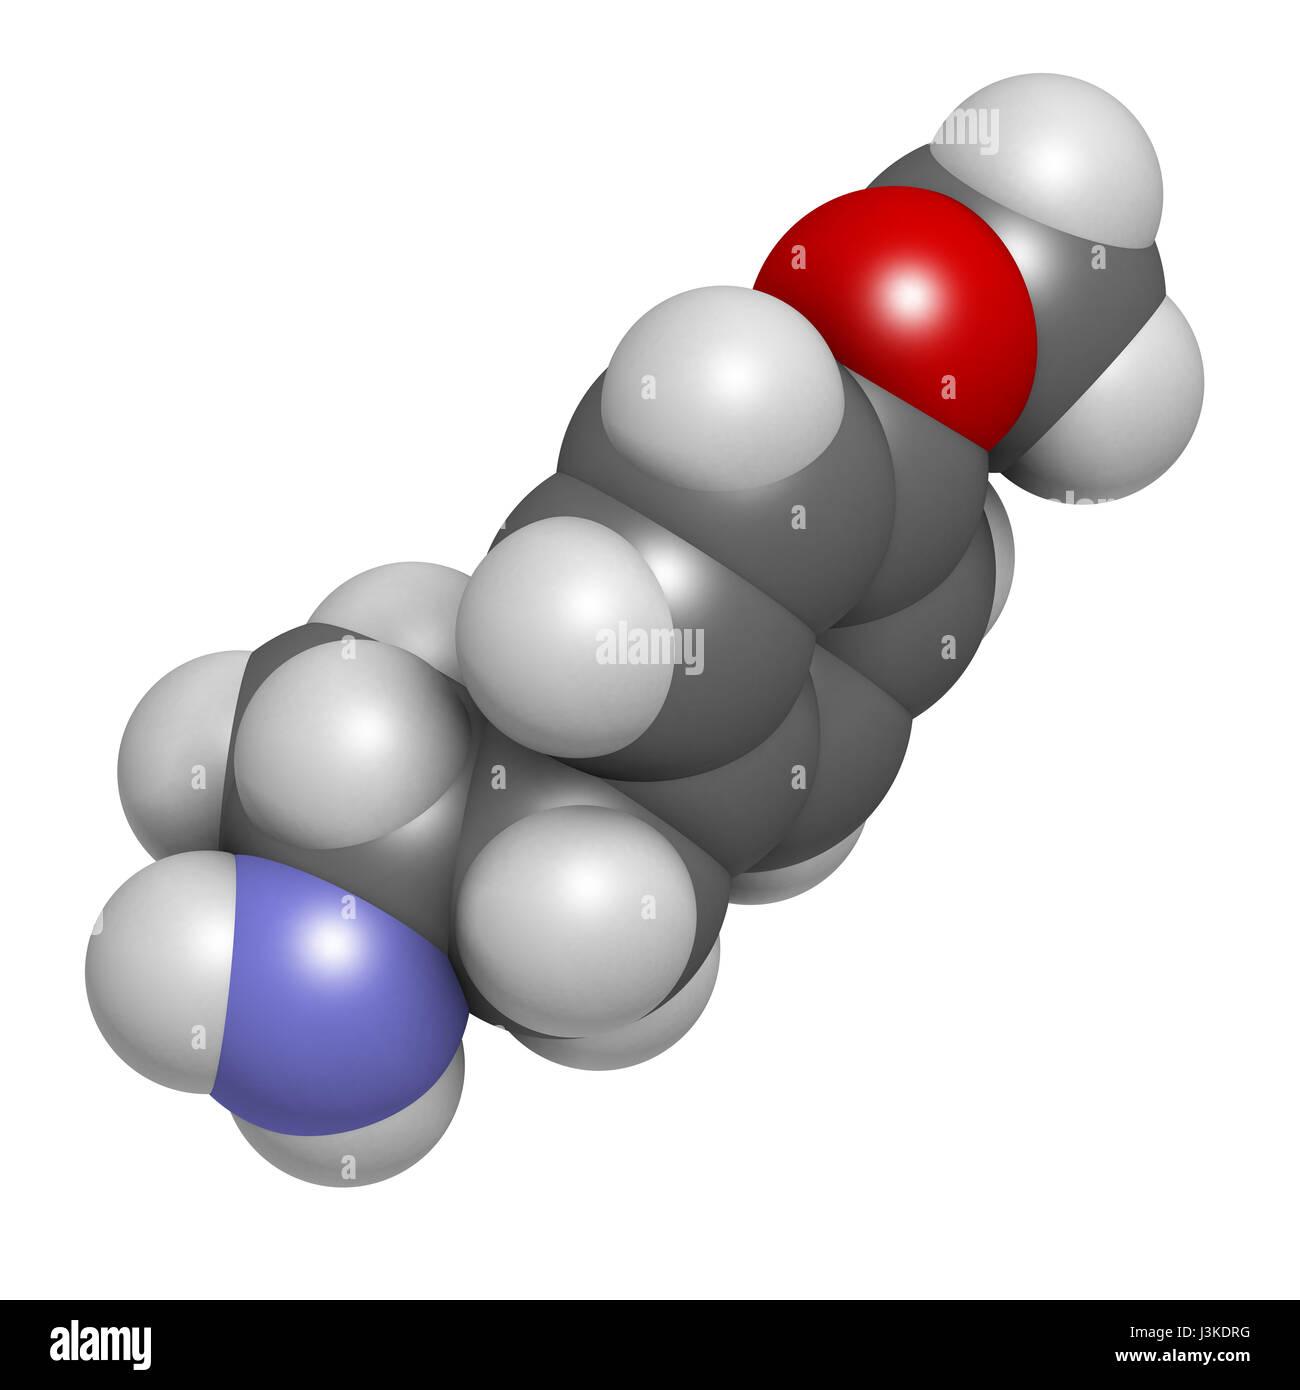 p-methoxyamphetamine (PMA) hallucinogenic drug molecule. Frequently leads to lethal poisoning when mistaken for - Stock Image